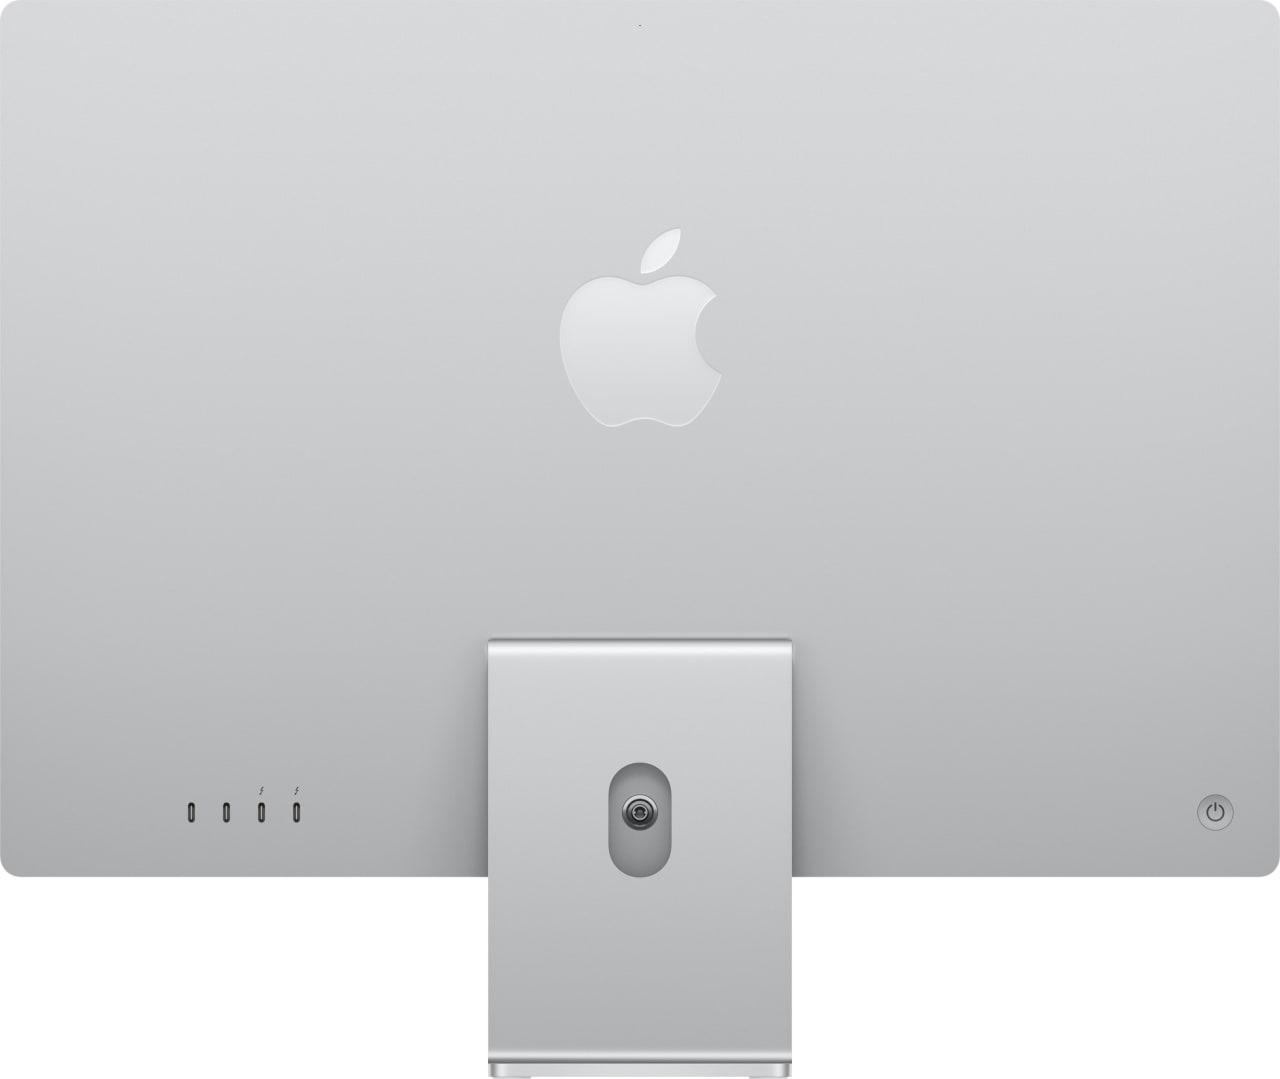 "Silver Apple 24"" iMac (Mid 2021) All-in-One - Apple M1 - 16GB - 512GB SSD - Apple Integrated 8-core GPU.3"